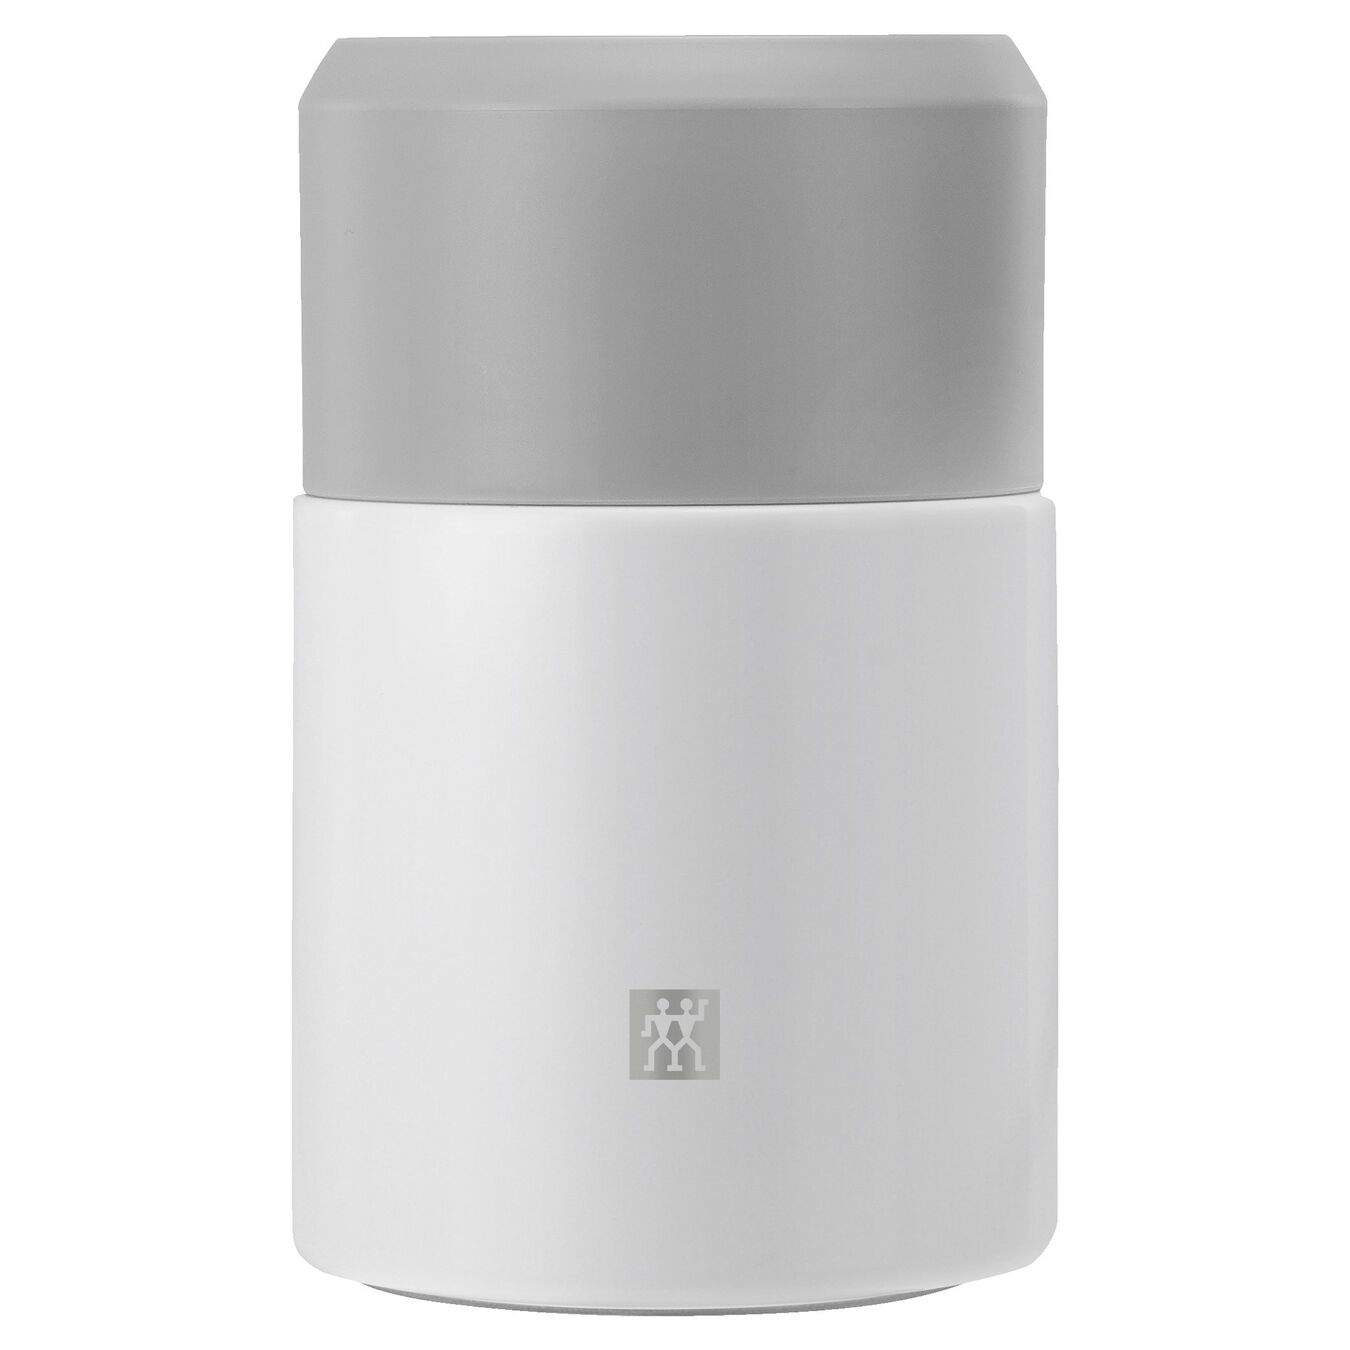 0.75-qt stainless steel Food jar,,large 1